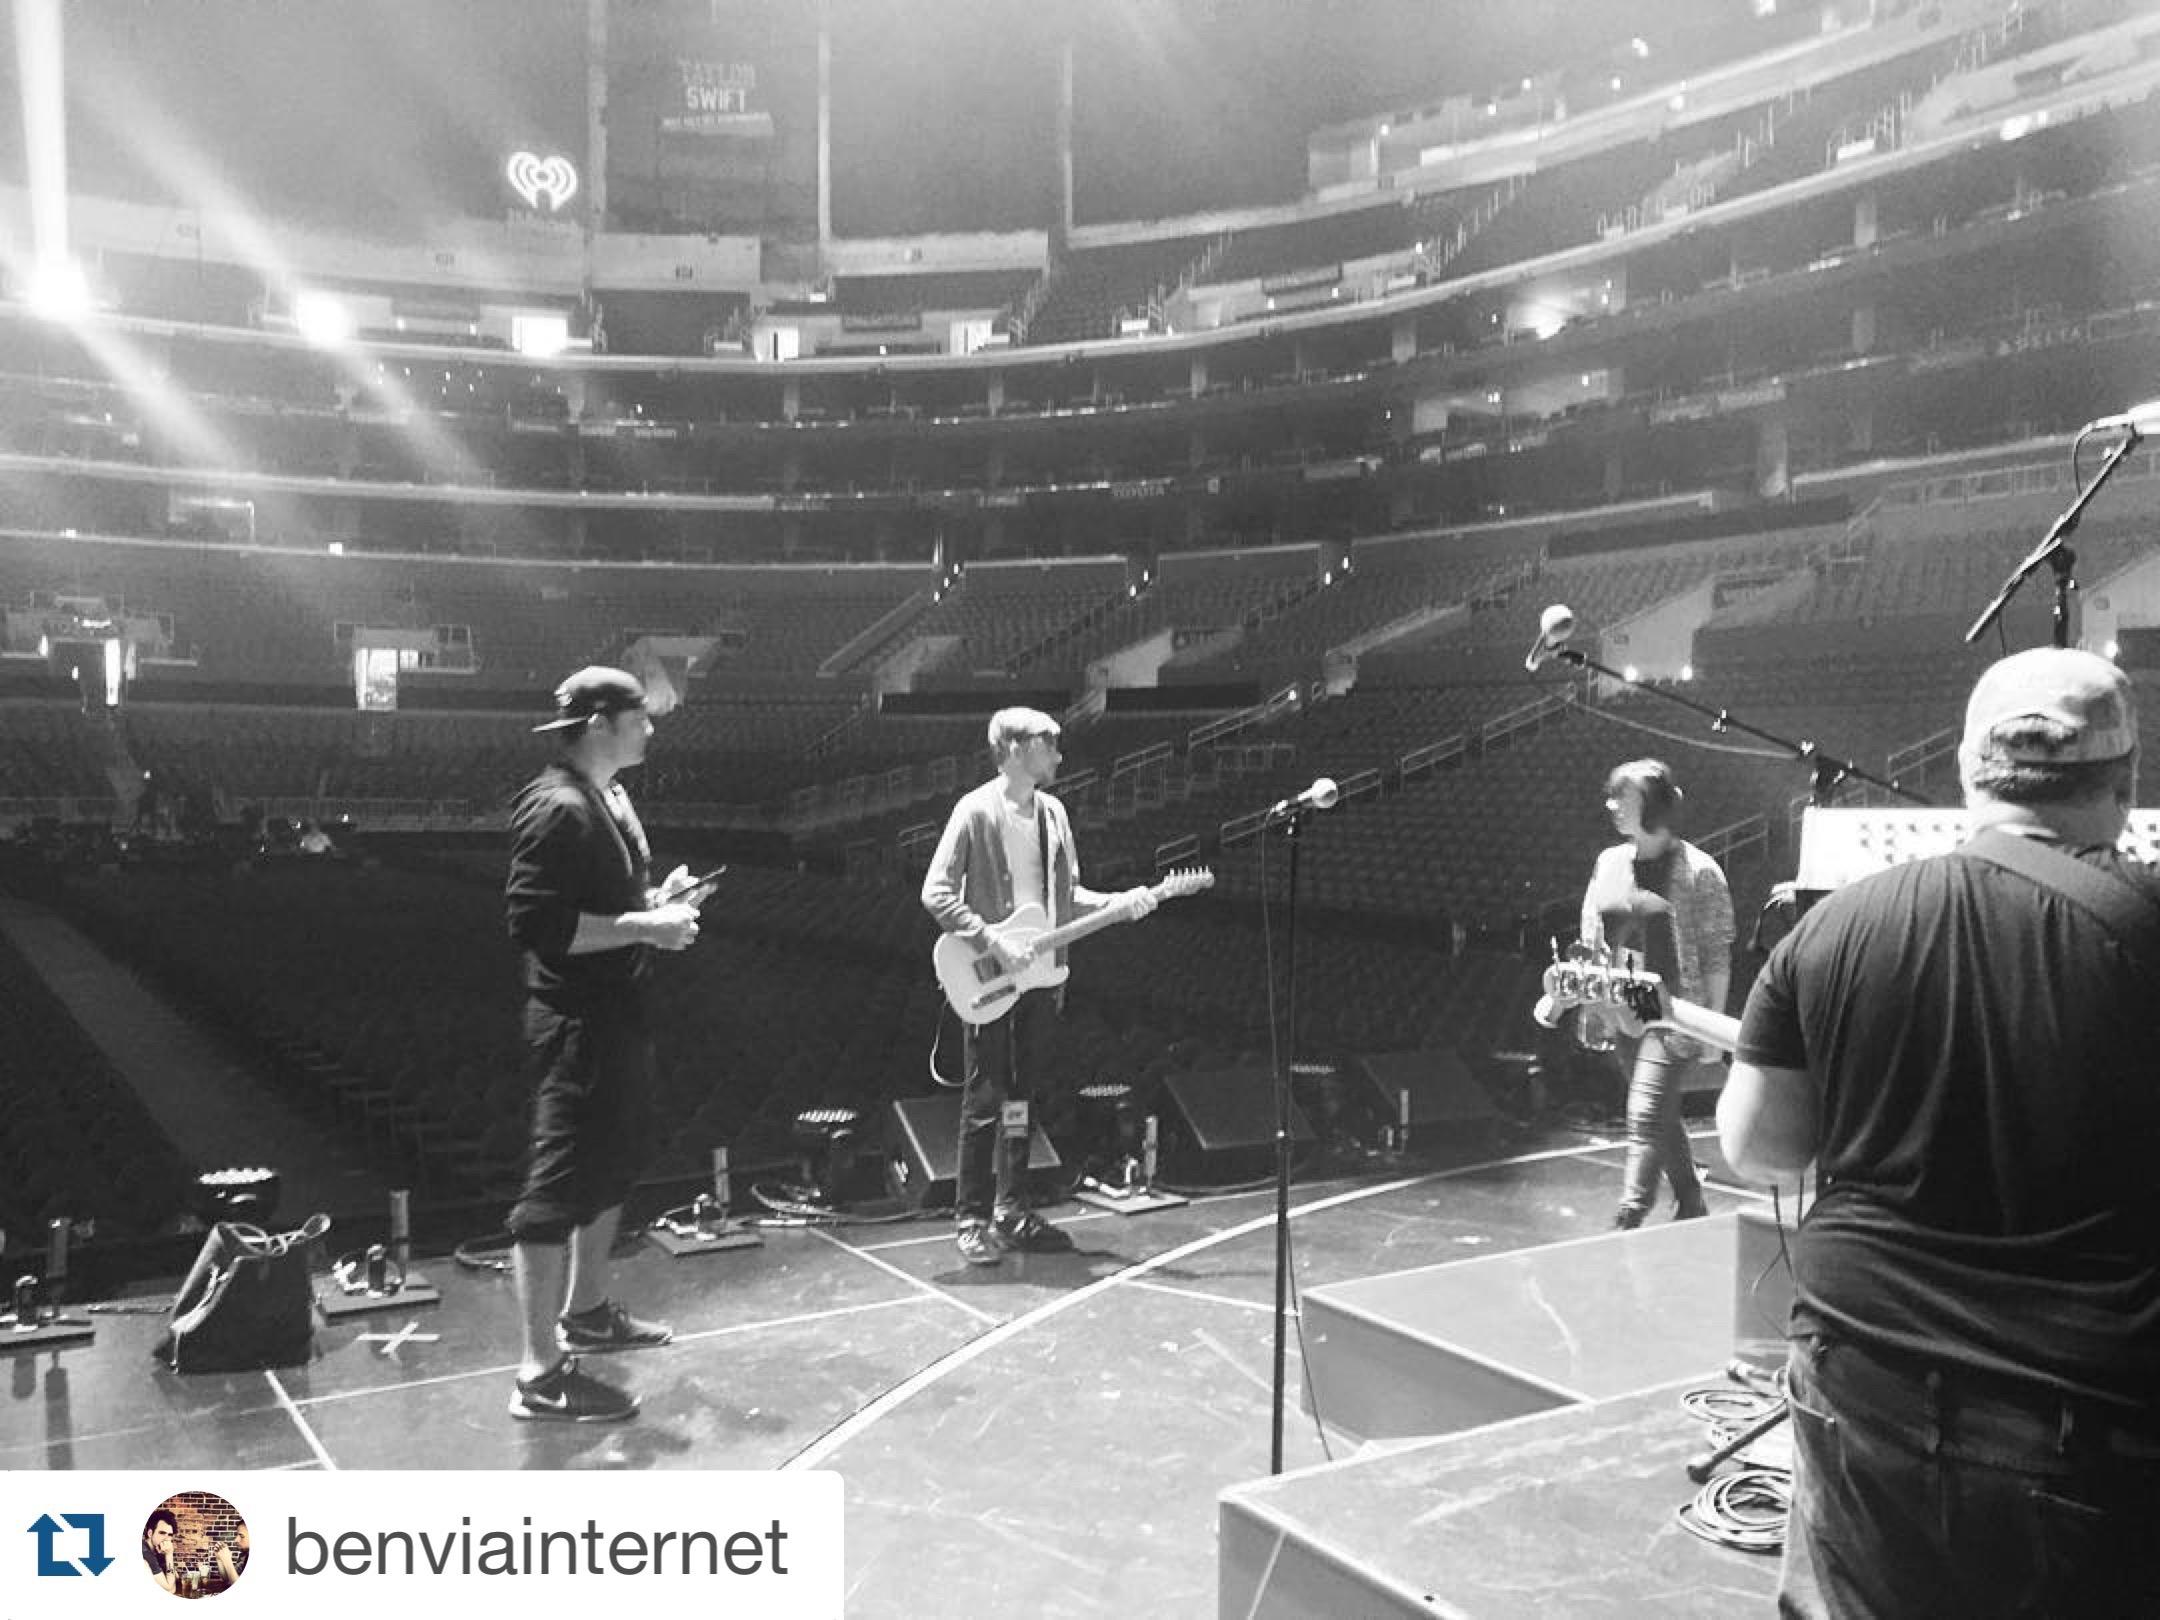 Staples Center, Selena Gomez soundcheck 12/15